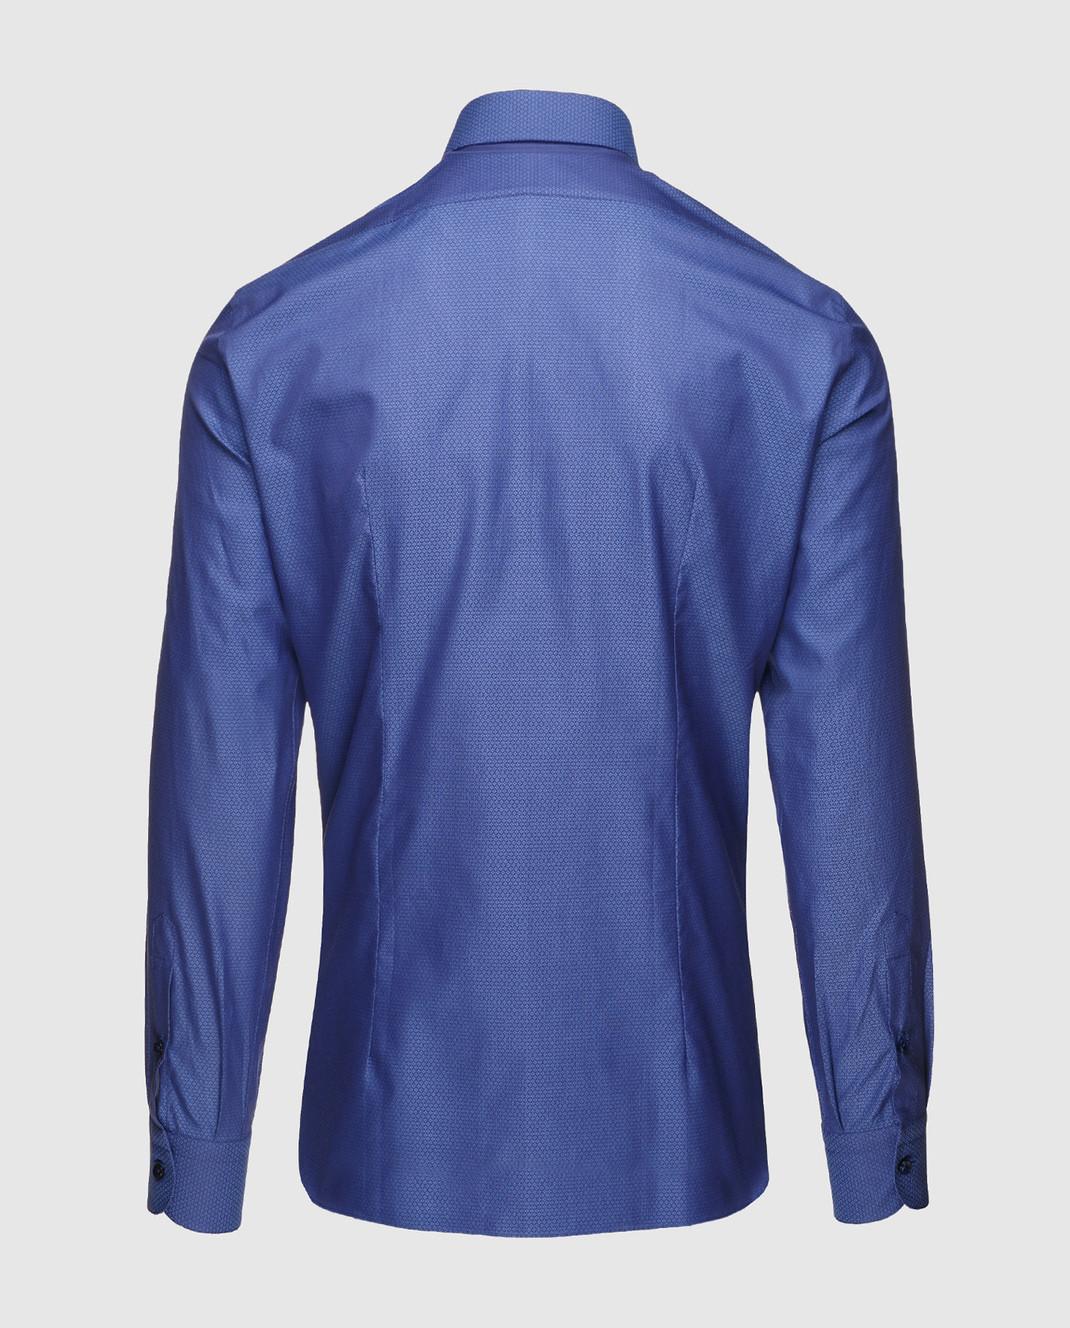 Marol Темно-синяя рубашка 8352 изображение 2